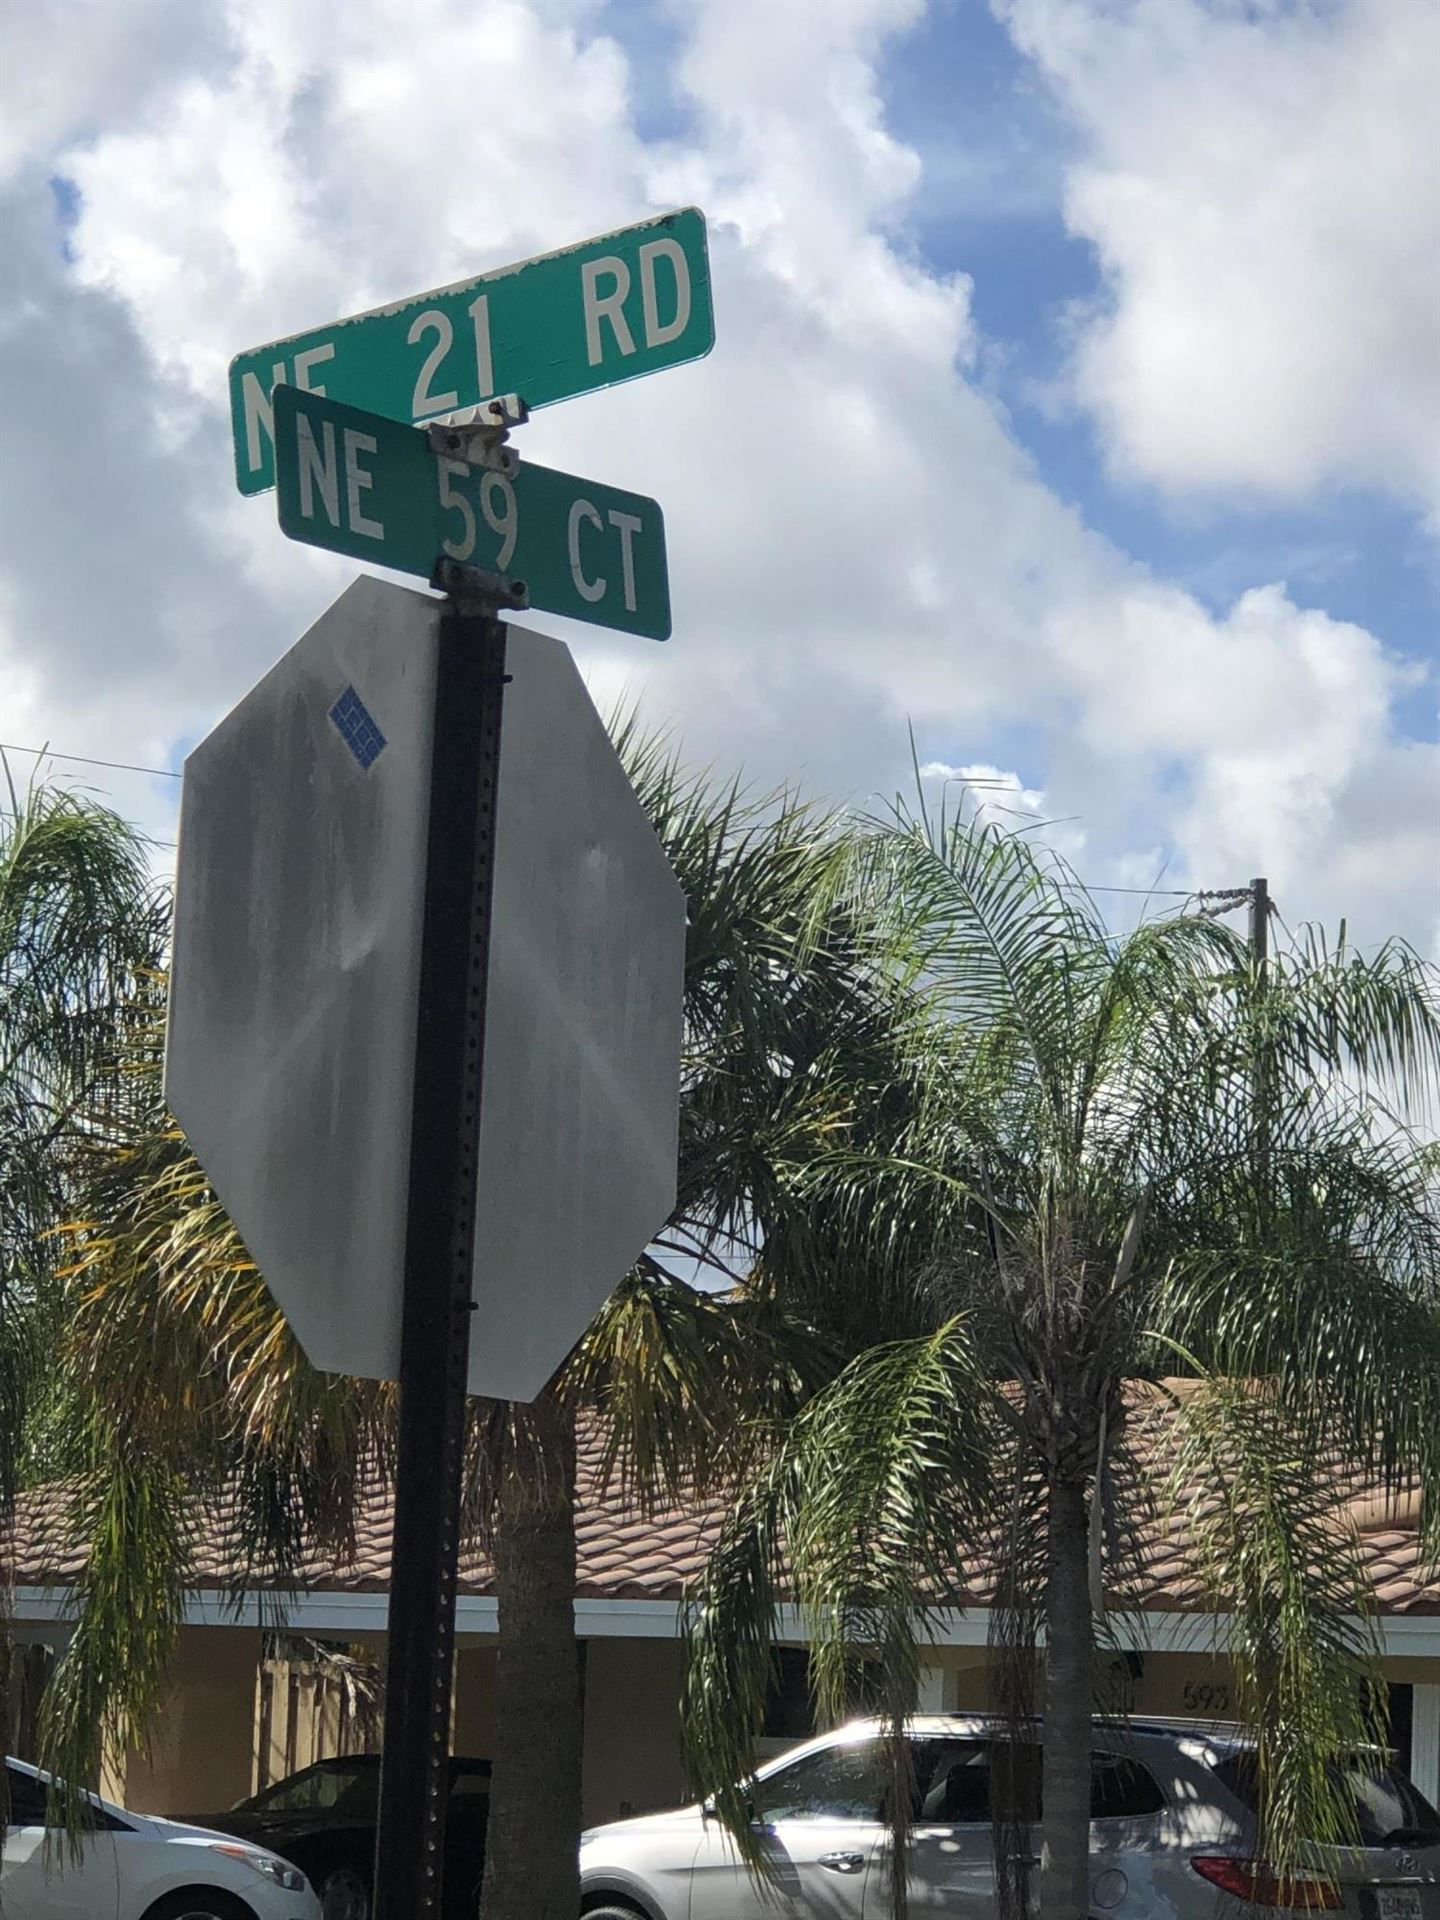 Photo of 2183 NE 59 Court, Fort Lauderdale, FL 33308 (MLS # RX-10674681)